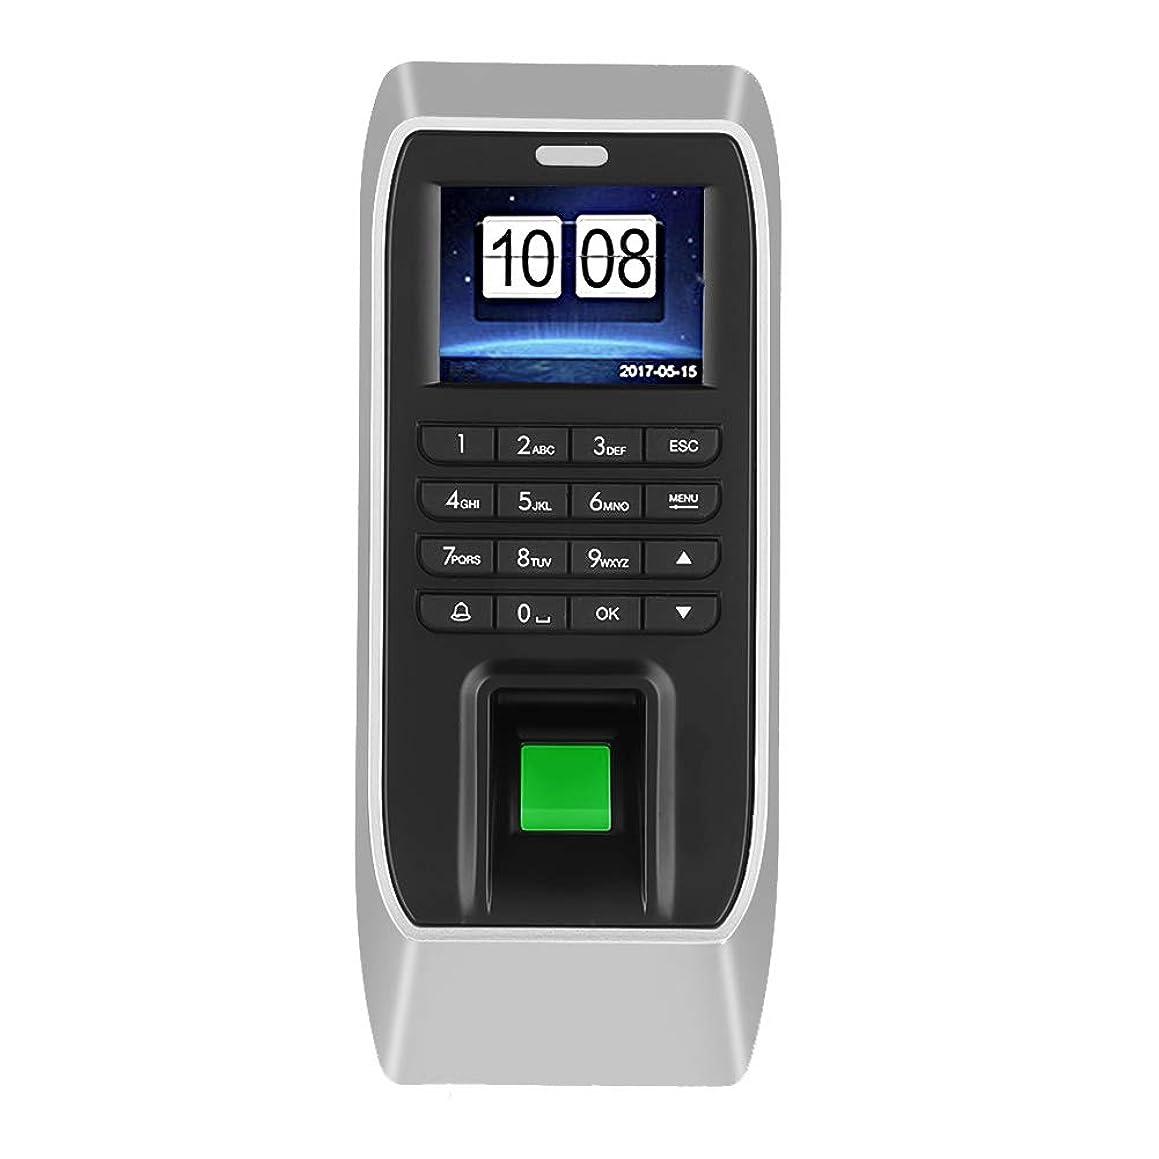 Security Biometric Fingerprint Door Lock Password Attendance Machine Employee Checking-in Recorder Fingerprint Intelligent Attendance Machine, 2.4 inches TFT LCD Office Time Attendance Clock